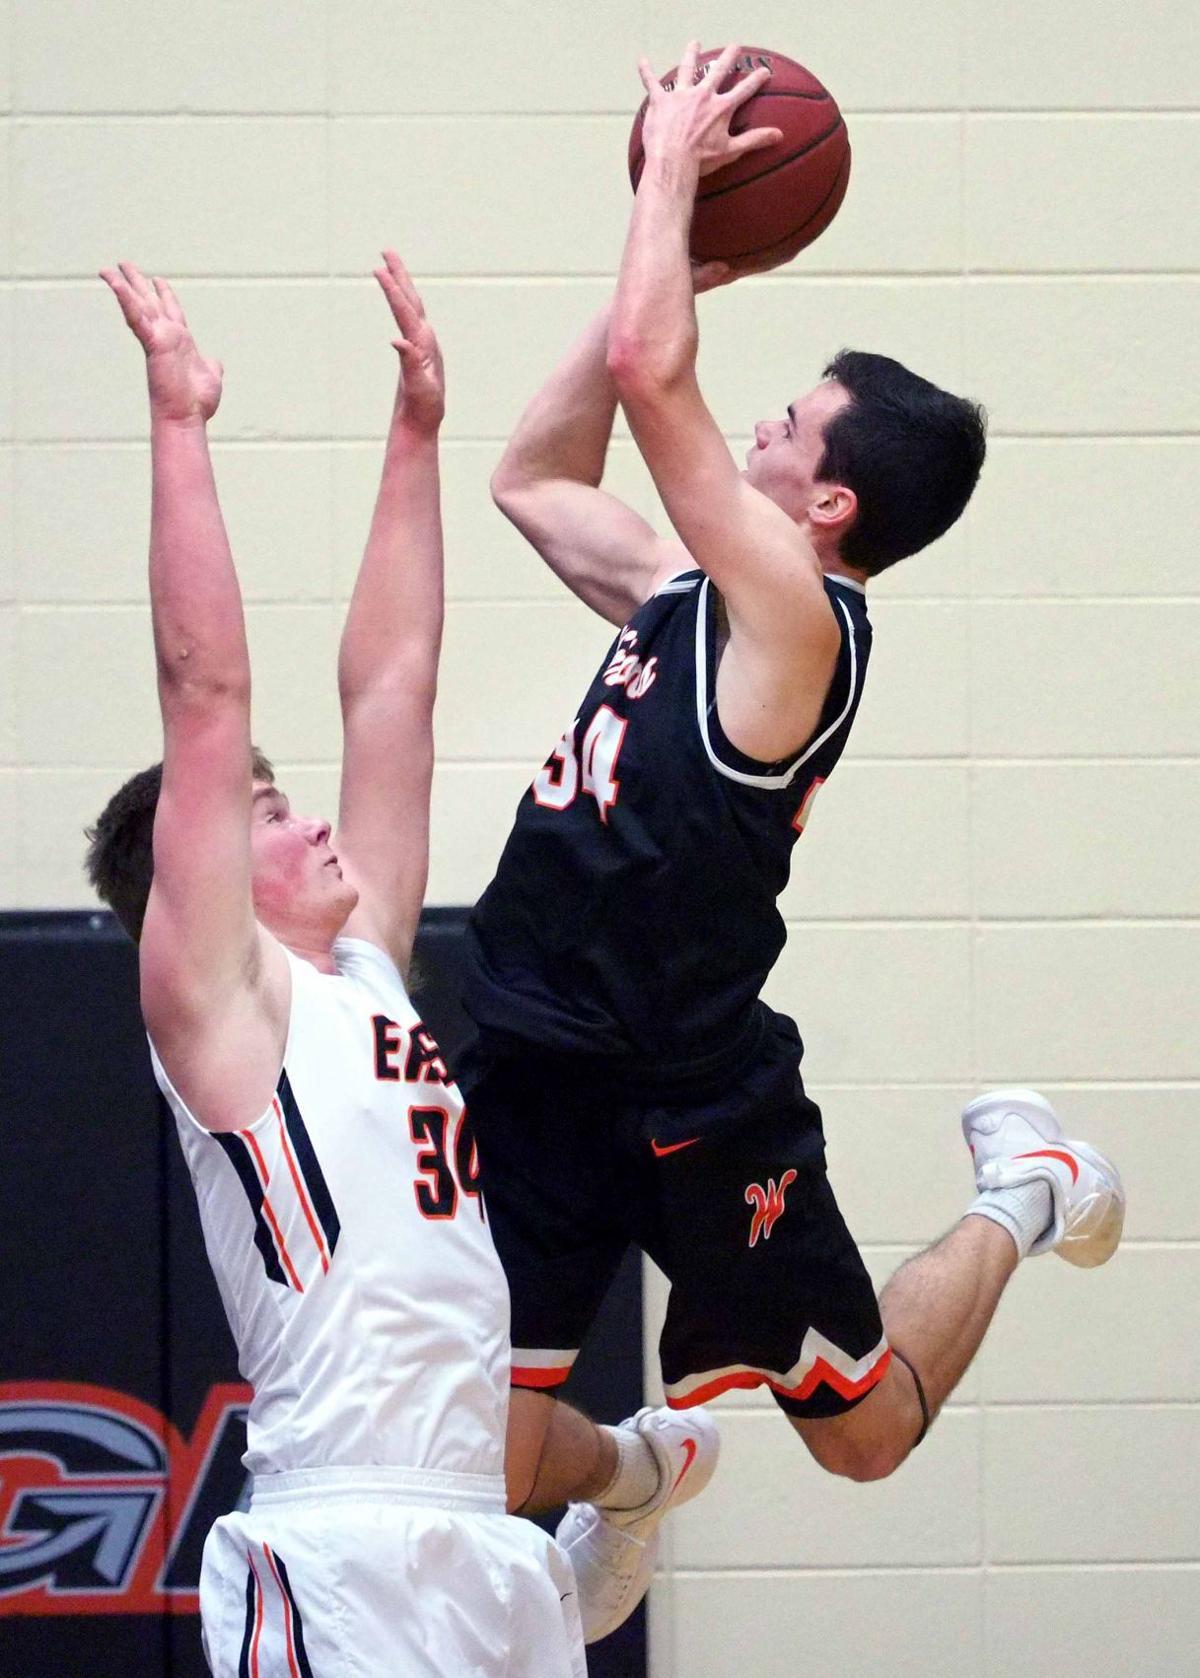 Sergeant Bluff-Luton at East High basketball